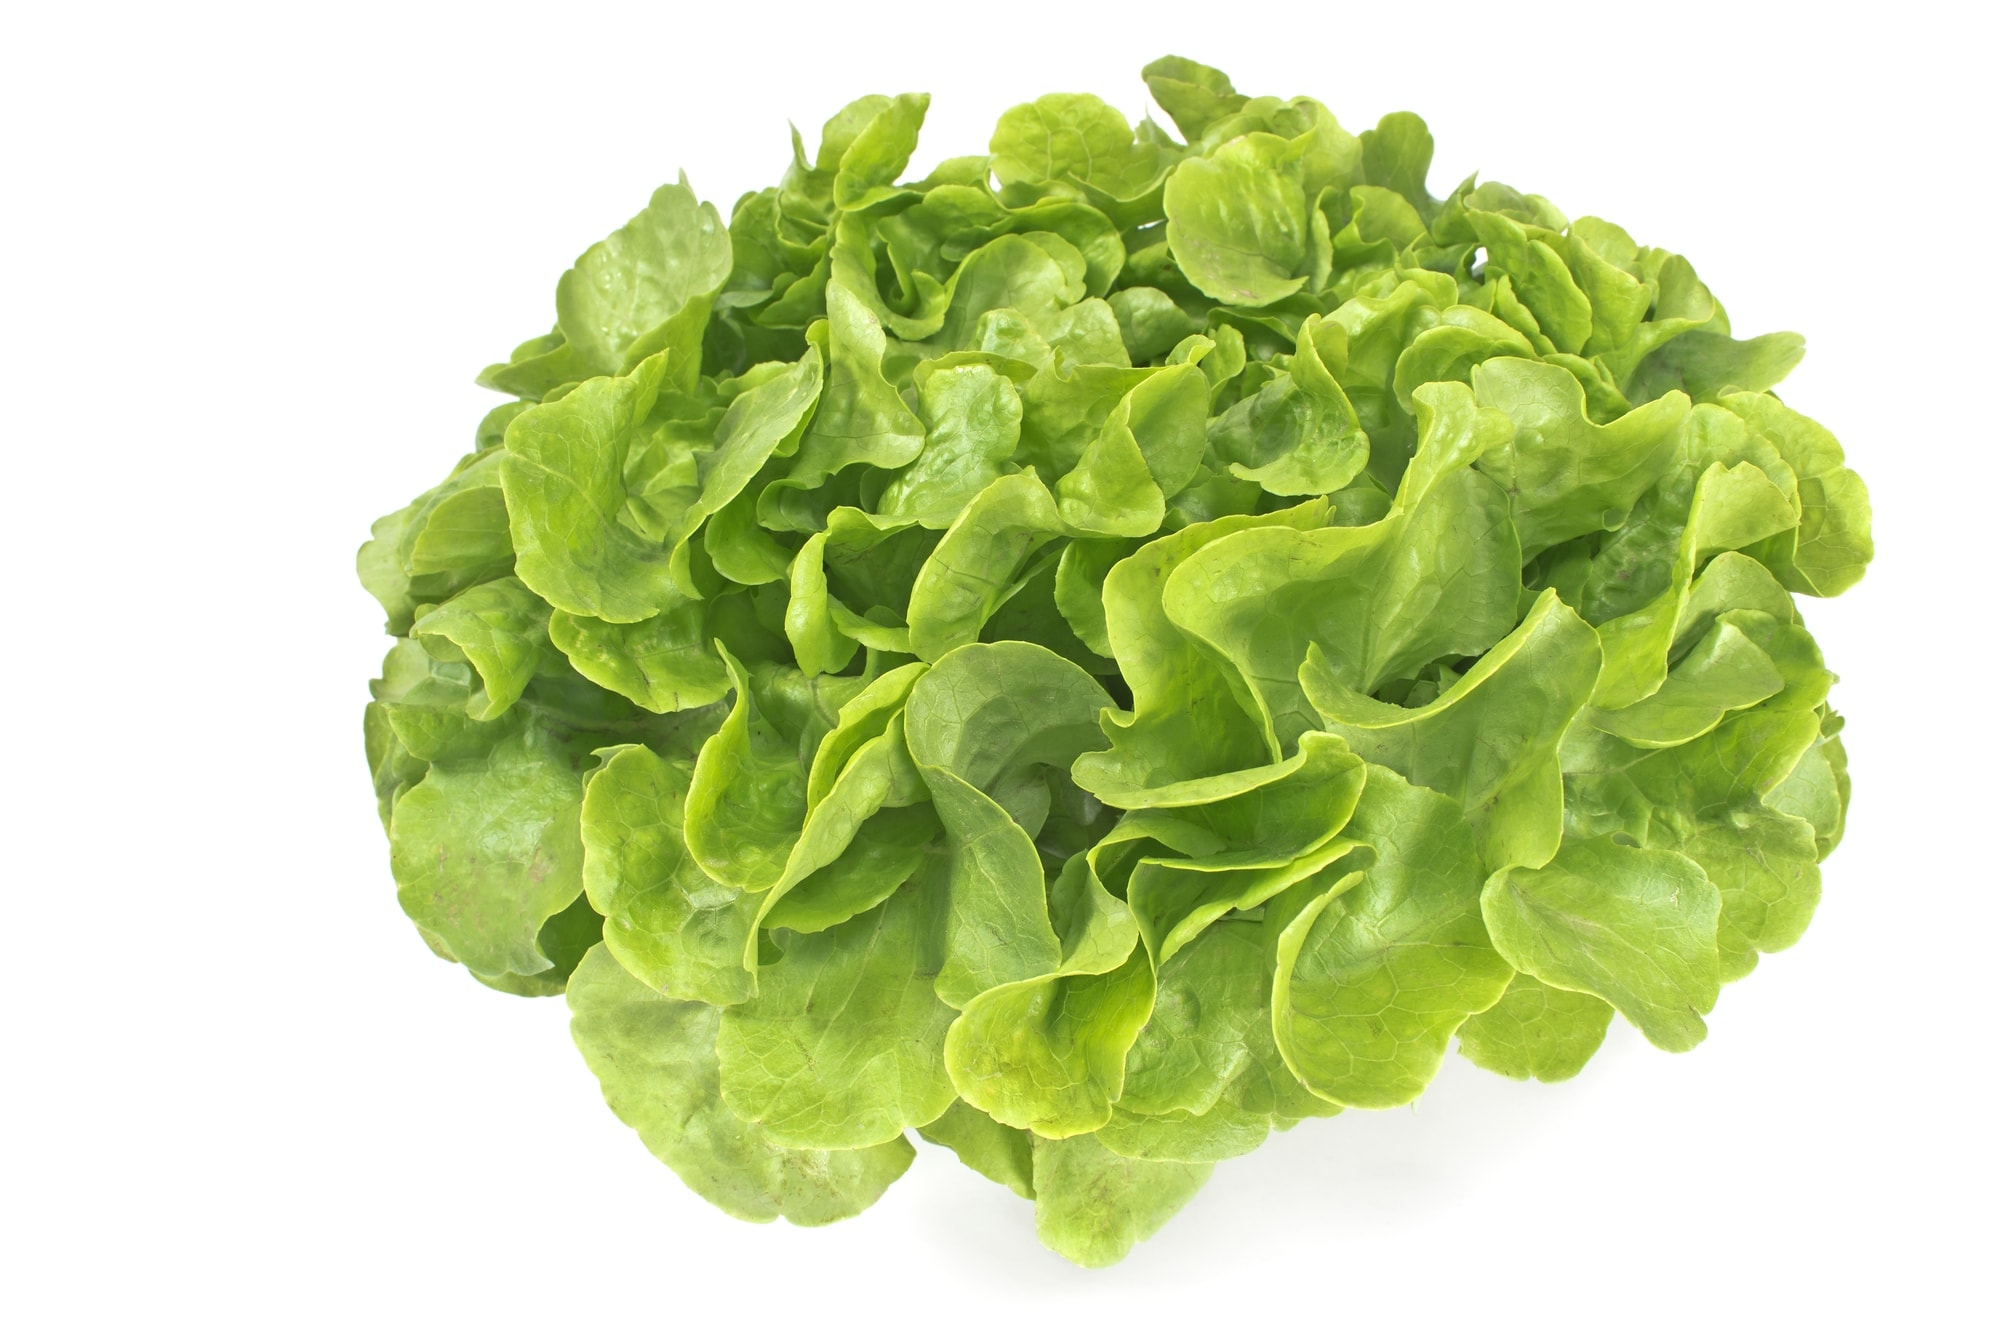 Fresh oak leaf lettuce isolated on white